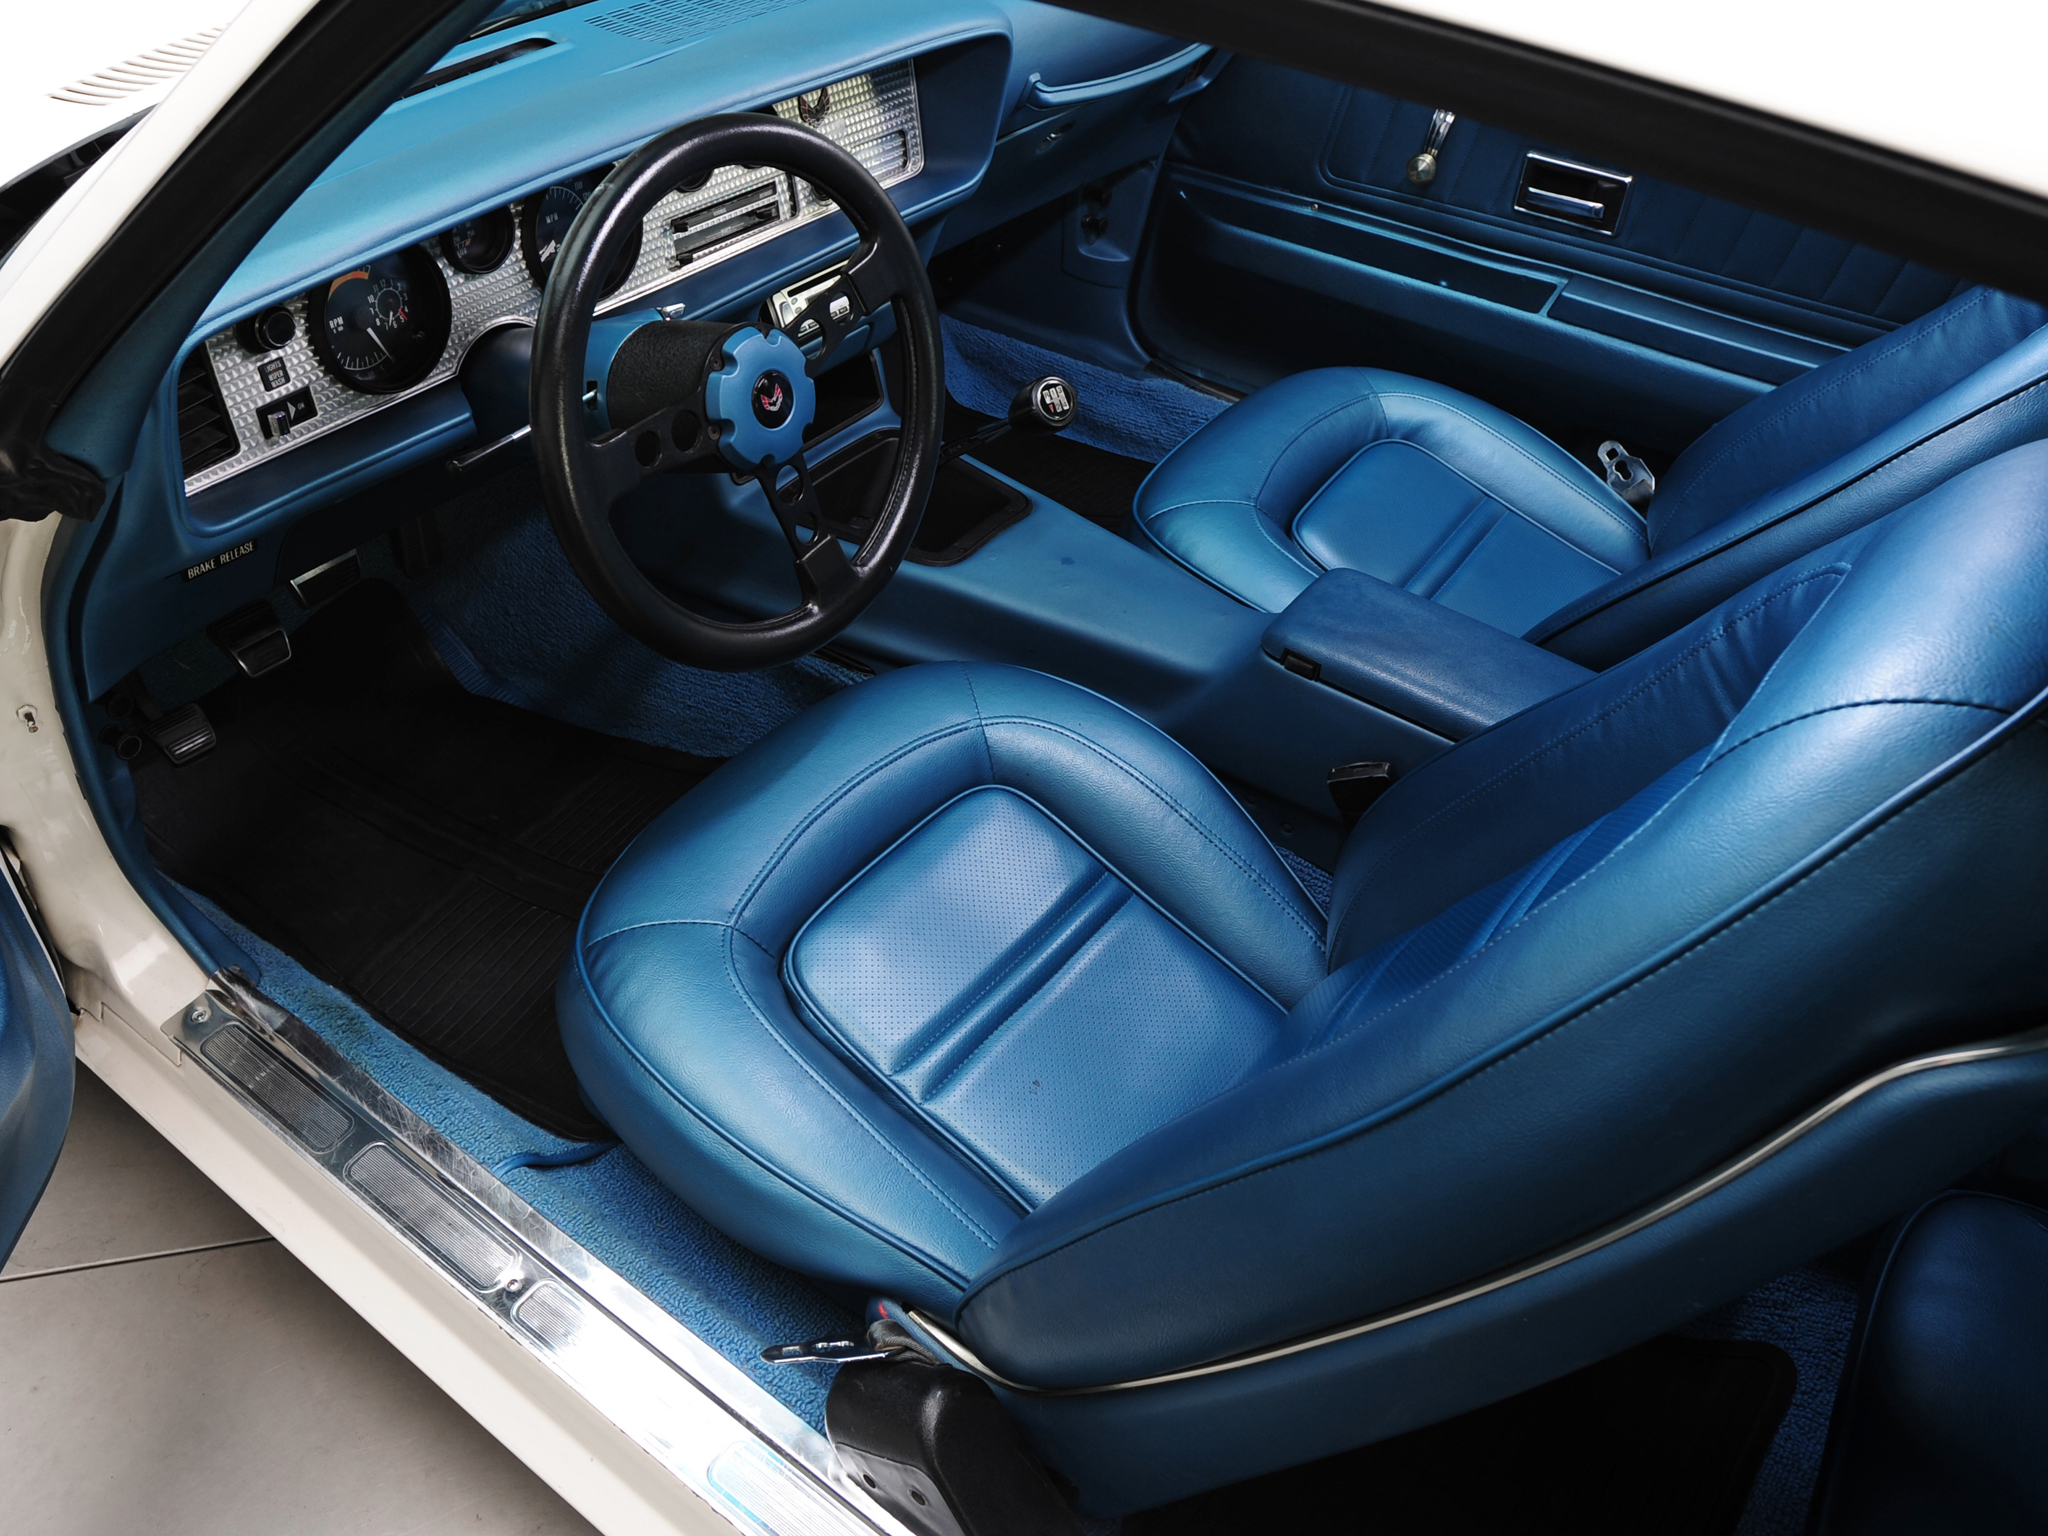 1973 Pontiac Firebird Trans Am V87 Muscle Classic Interior Wallpaper 2048x1536 116036